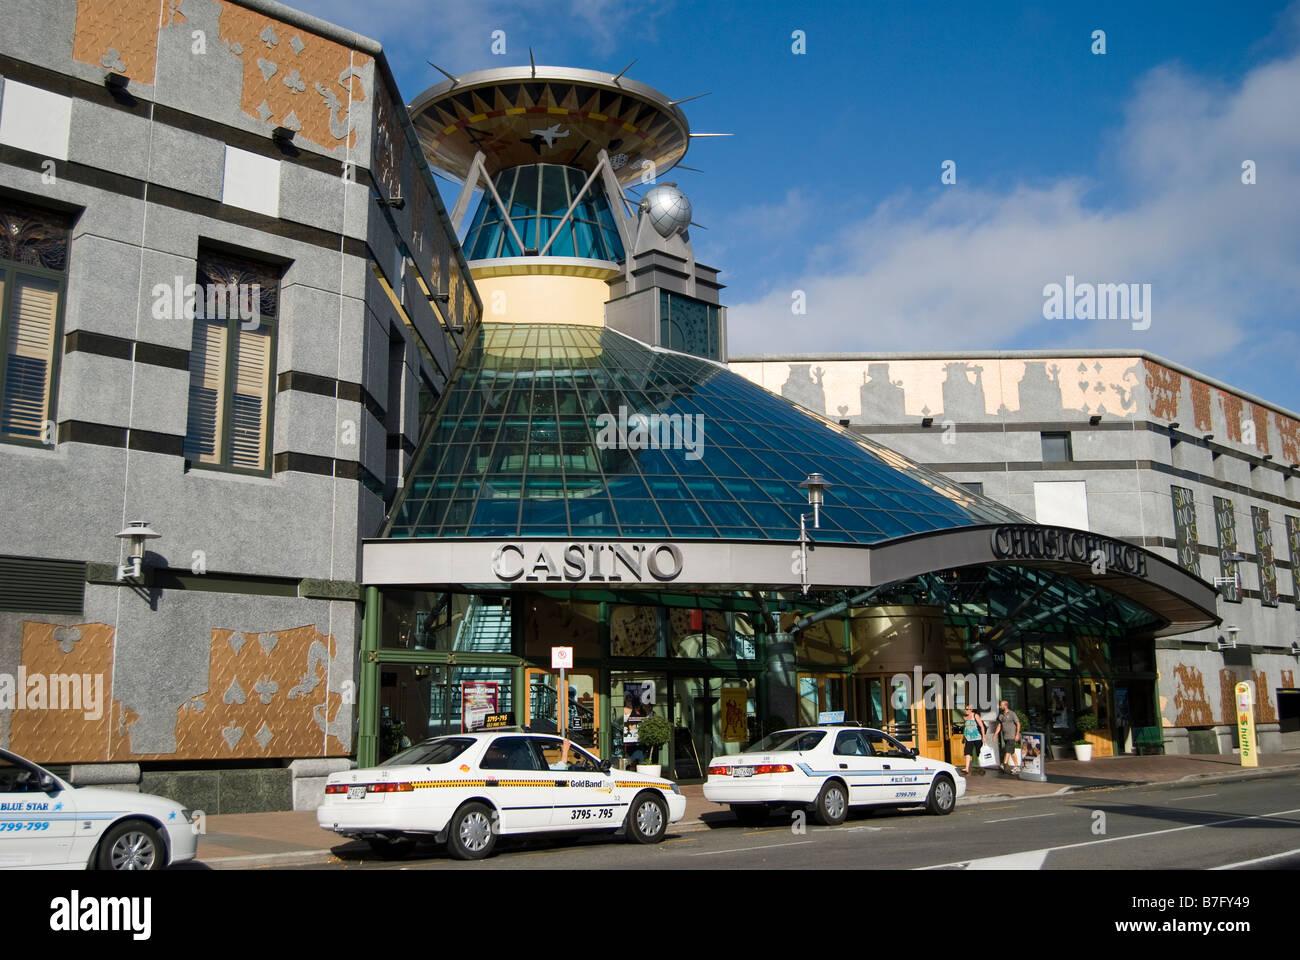 Christchurch casino new zealand gambling federation casino online poker rooms